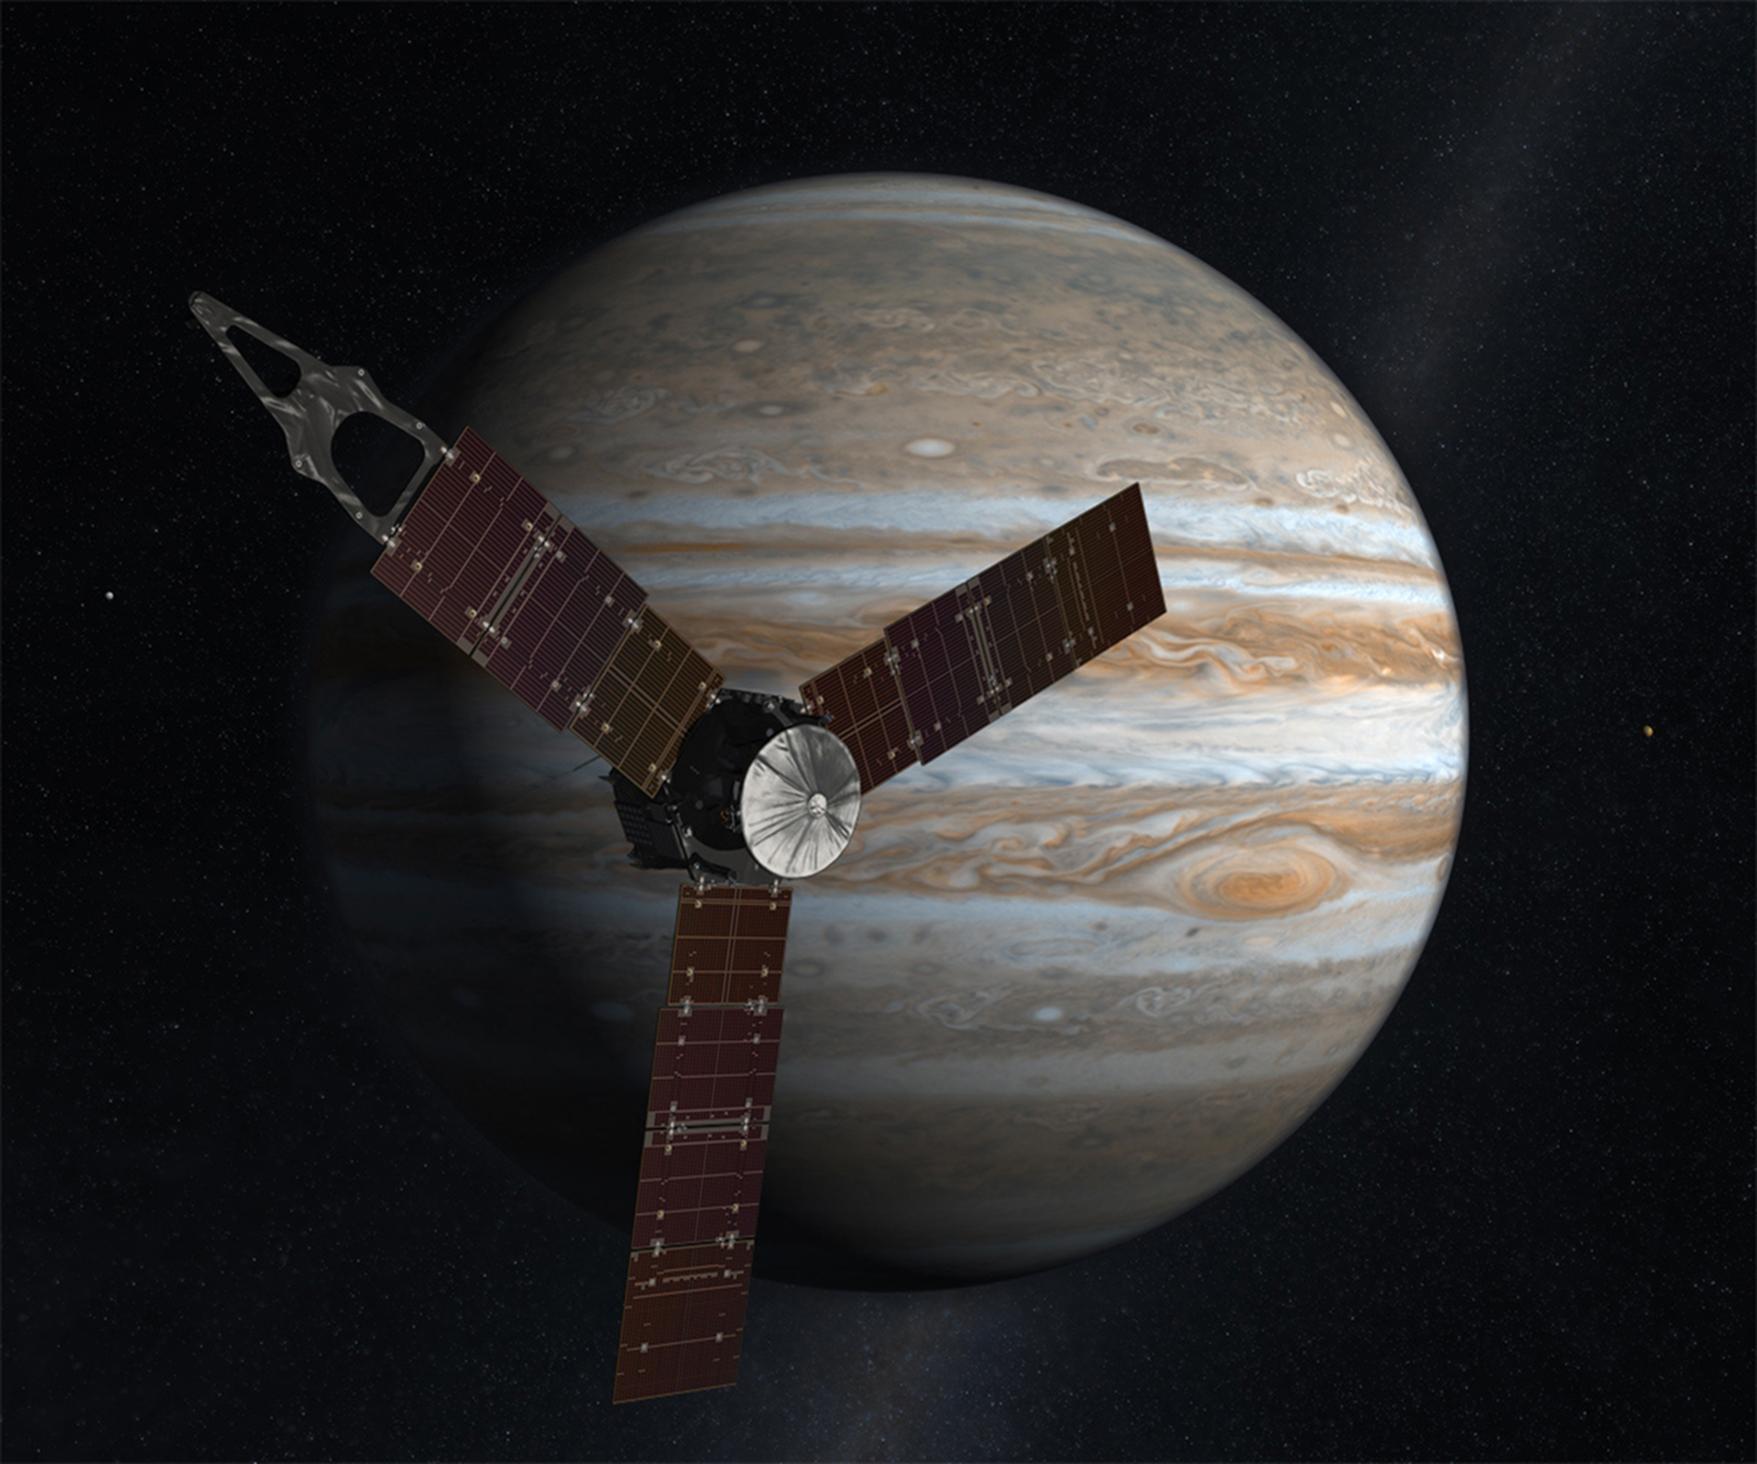 Juno Overview